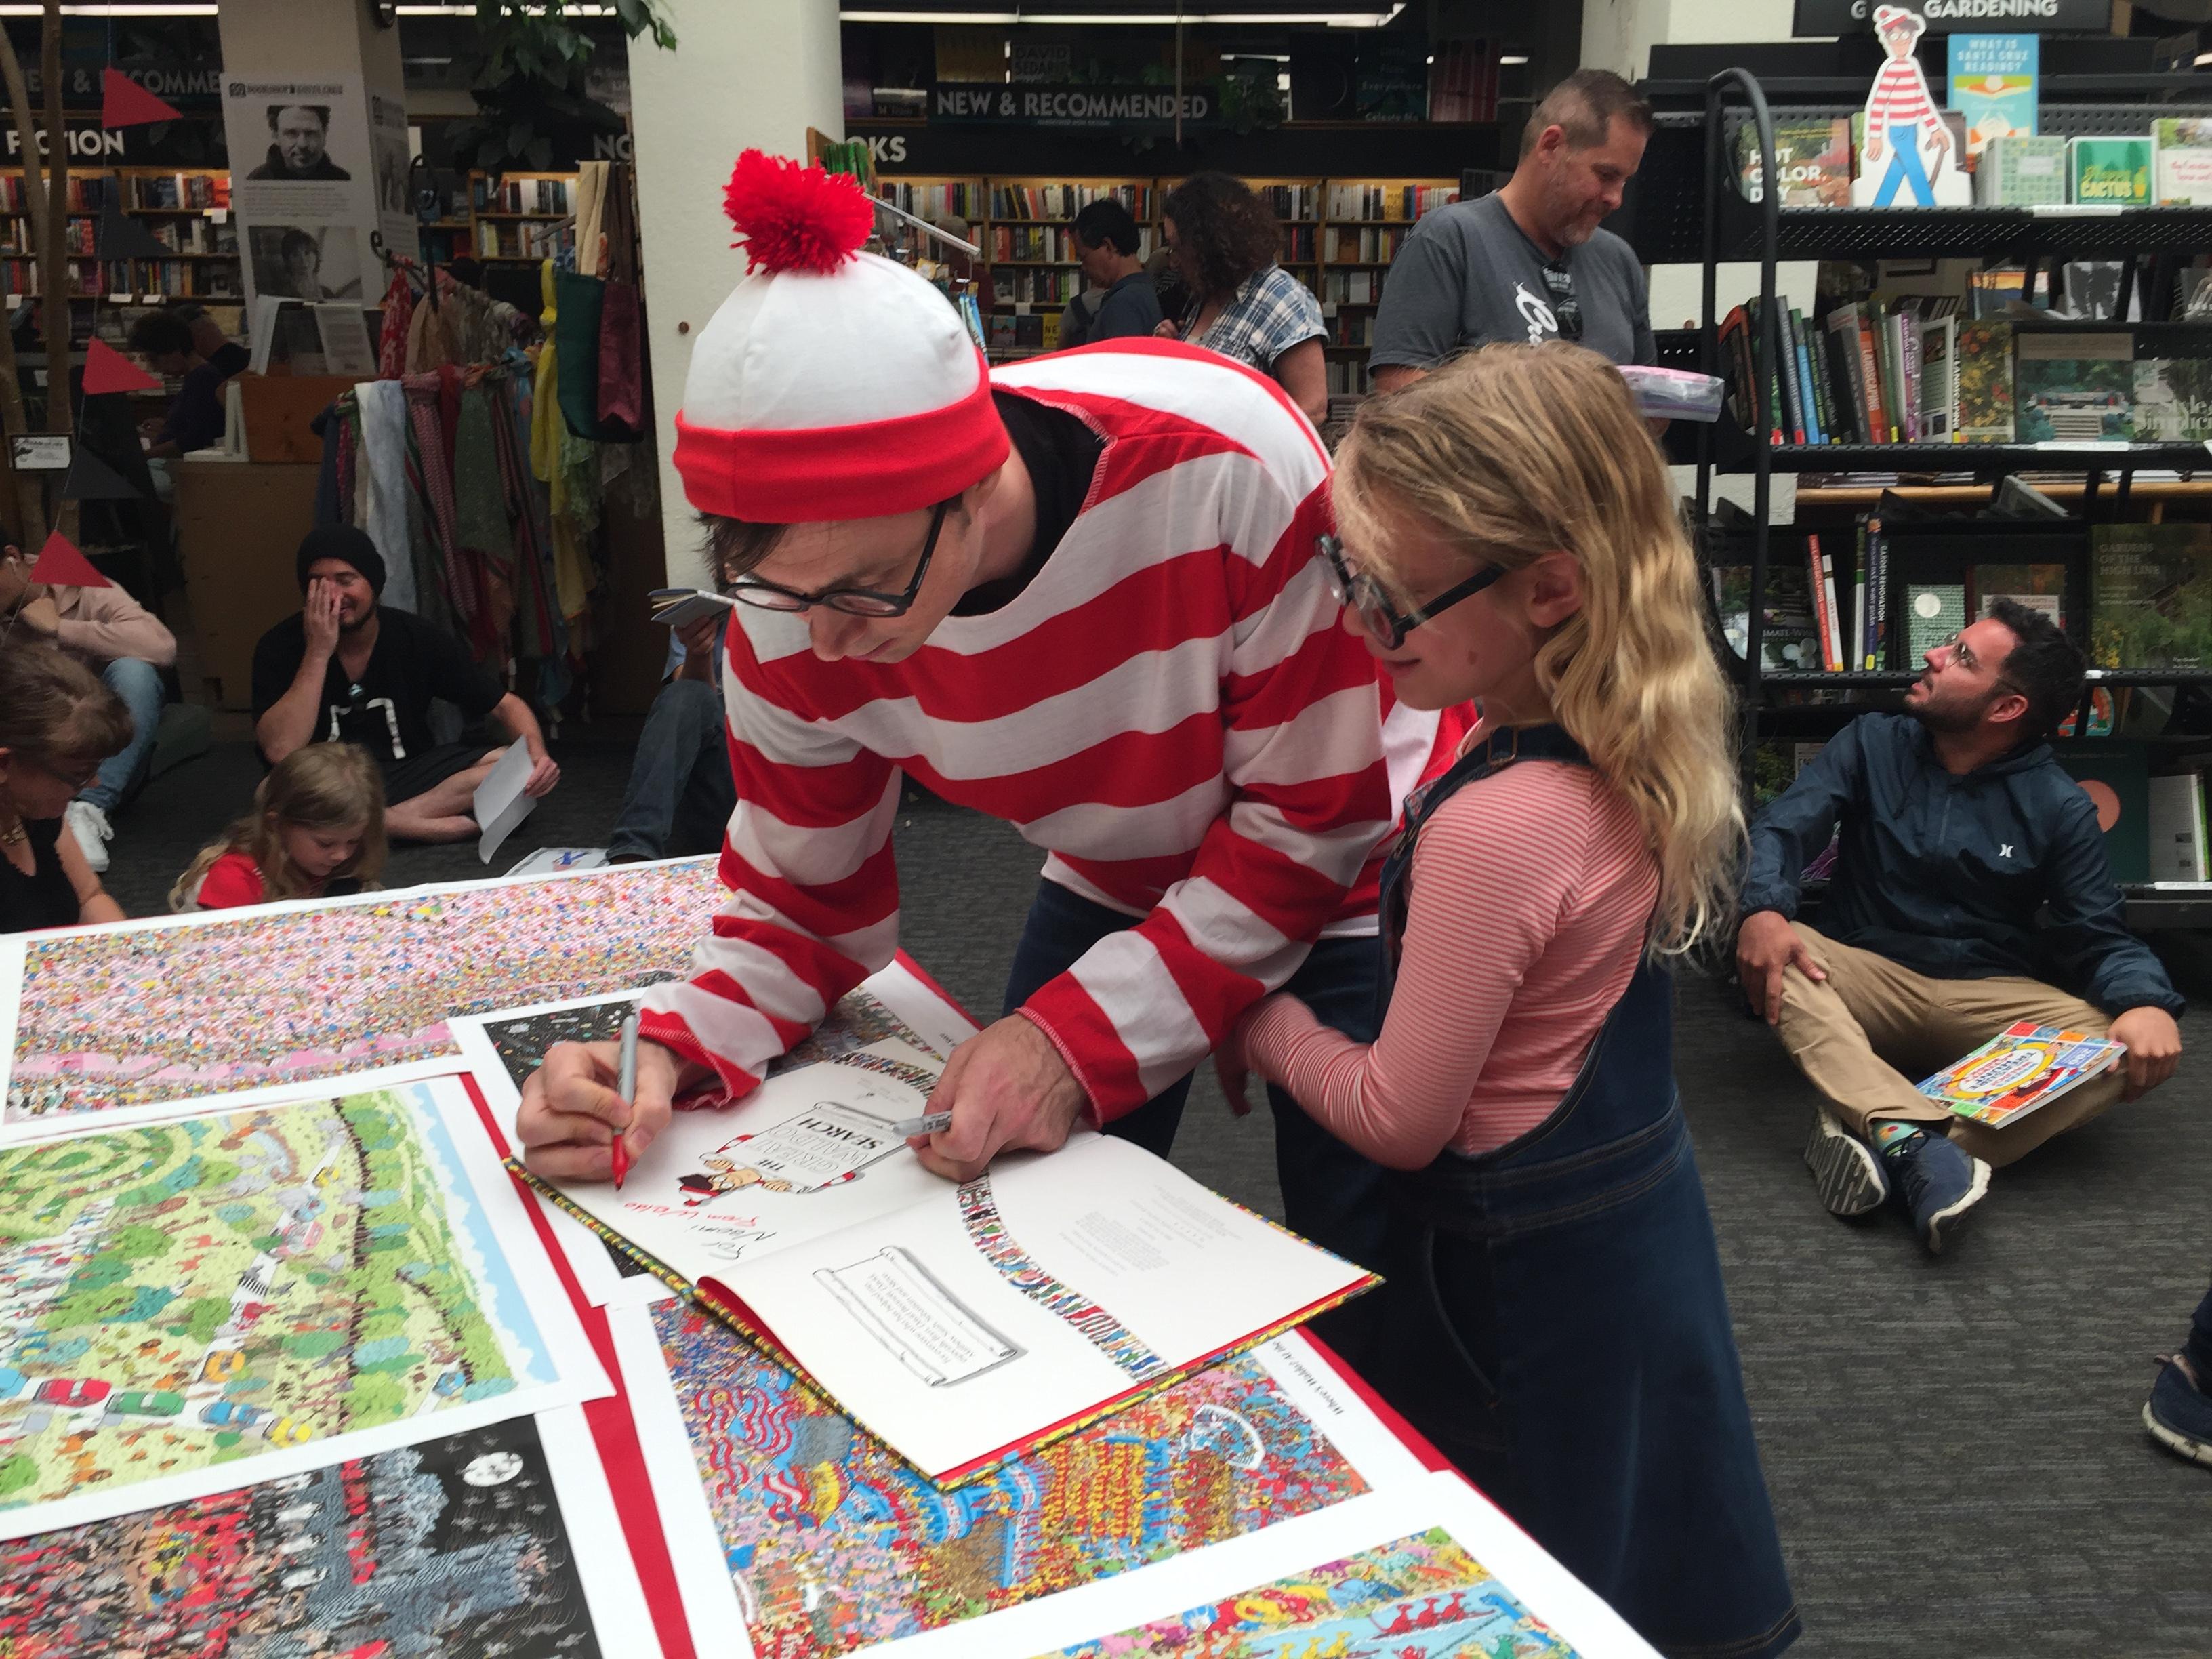 A staff member dressed as Waldo signs a participant's book at Bookshop Santa Cruz.